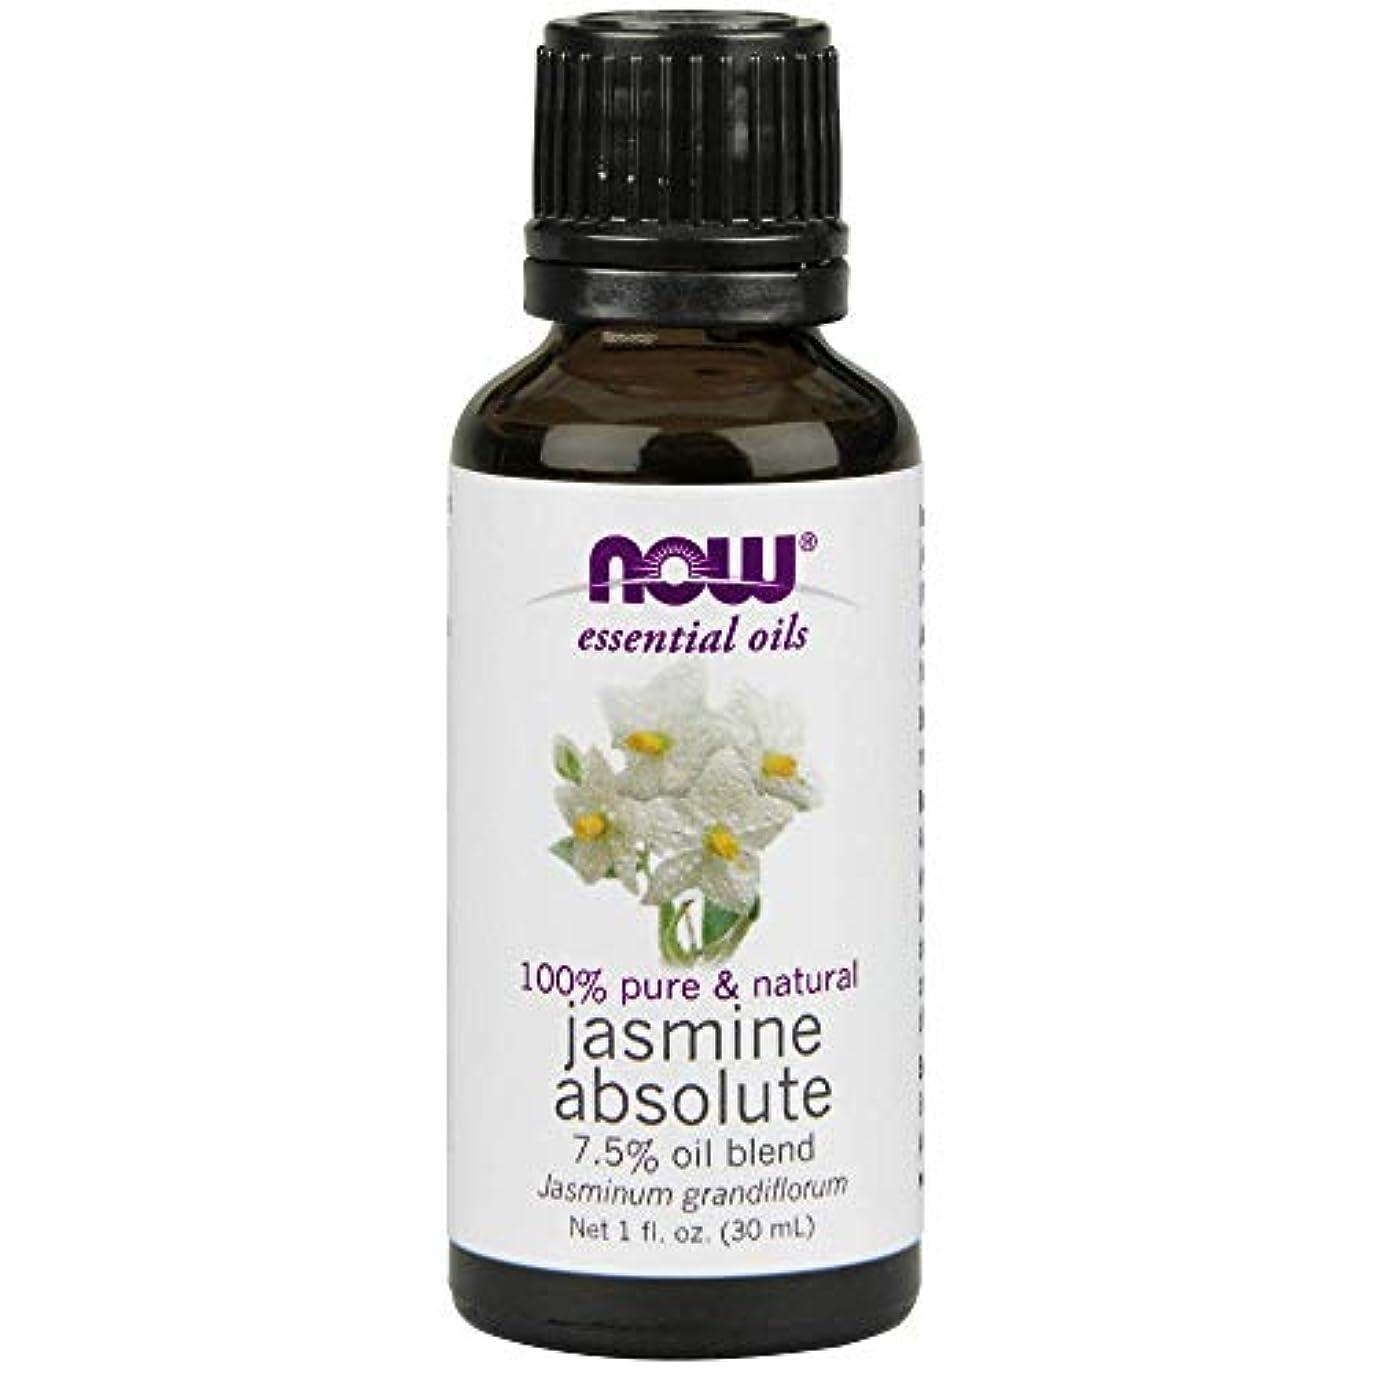 Now - Jasmine Absolute Oil 7.5% Oil Blend 1 oz (30 ml) [並行輸入品]